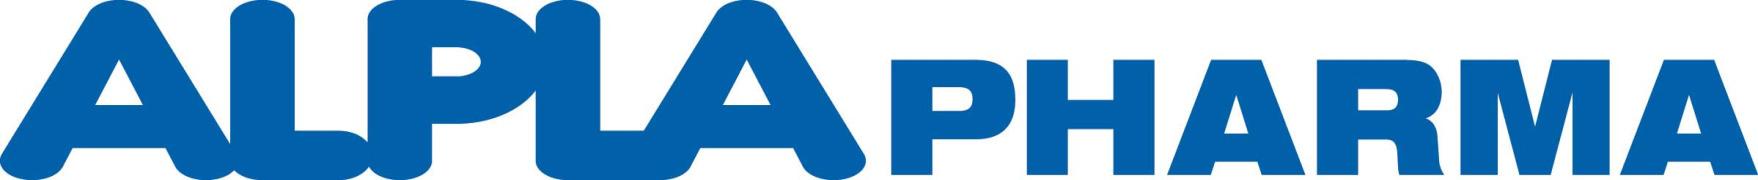 Alpla Werke, A. Lehner GmbH & Co. KG